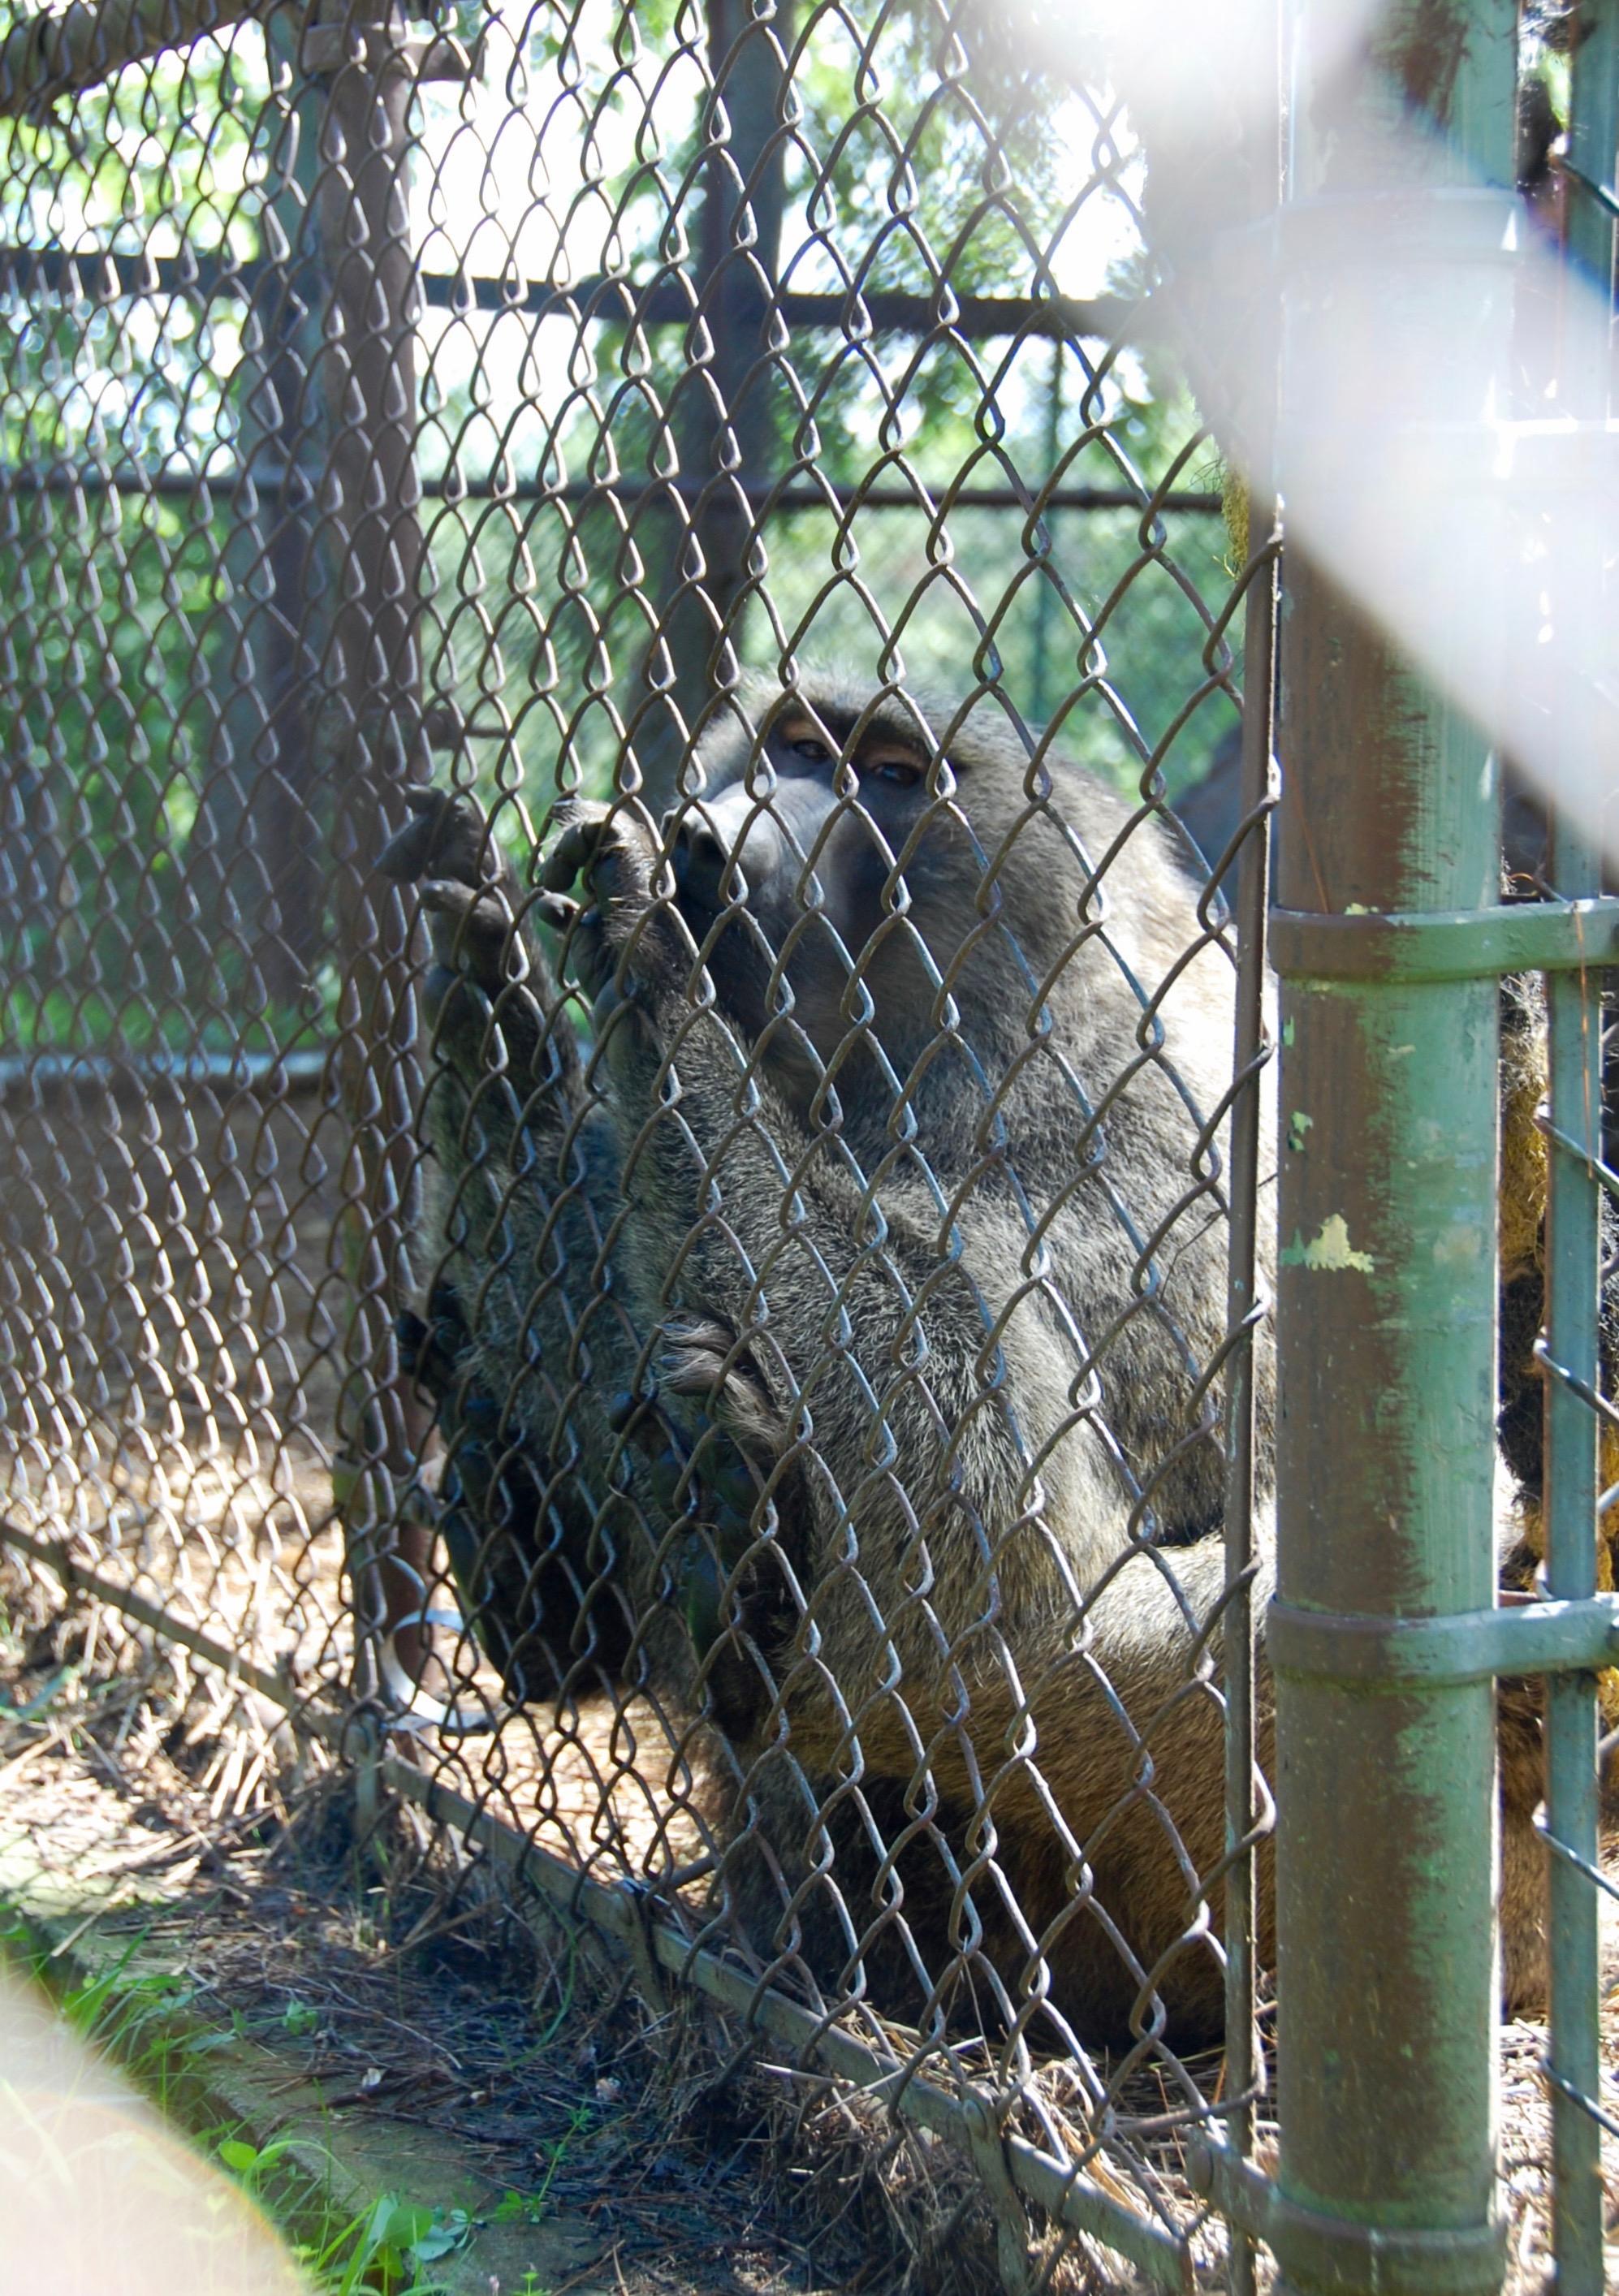 bailiwick ranch zoo babboon